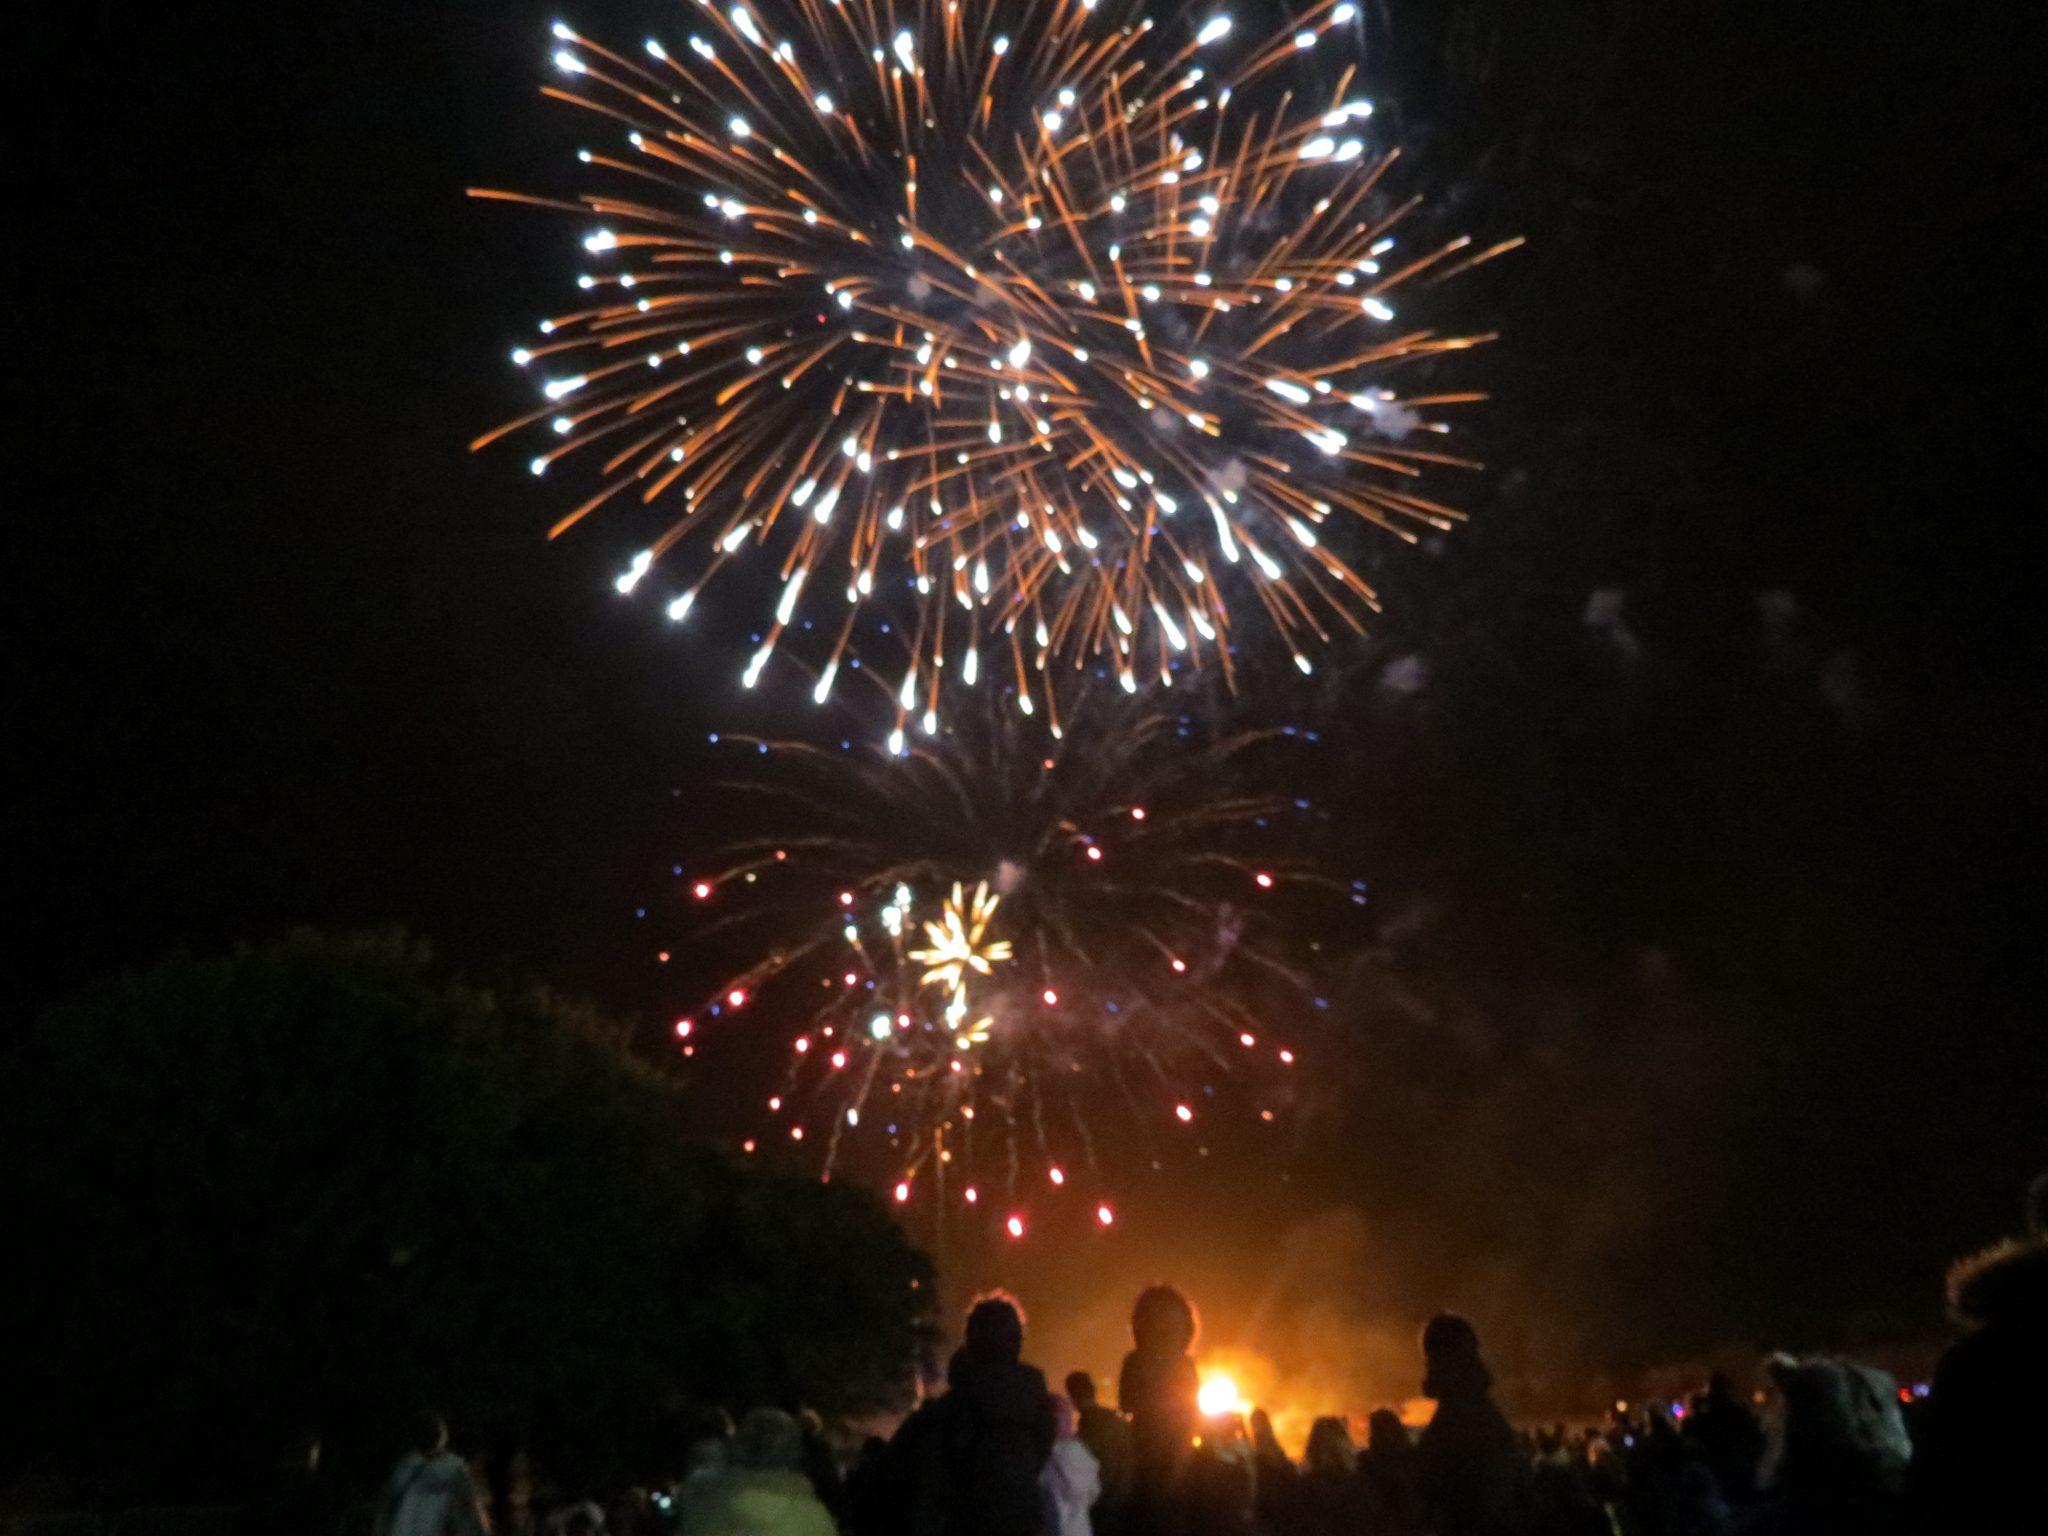 Robin Hood Bonfire Society event 2018, PLIRB First Aid